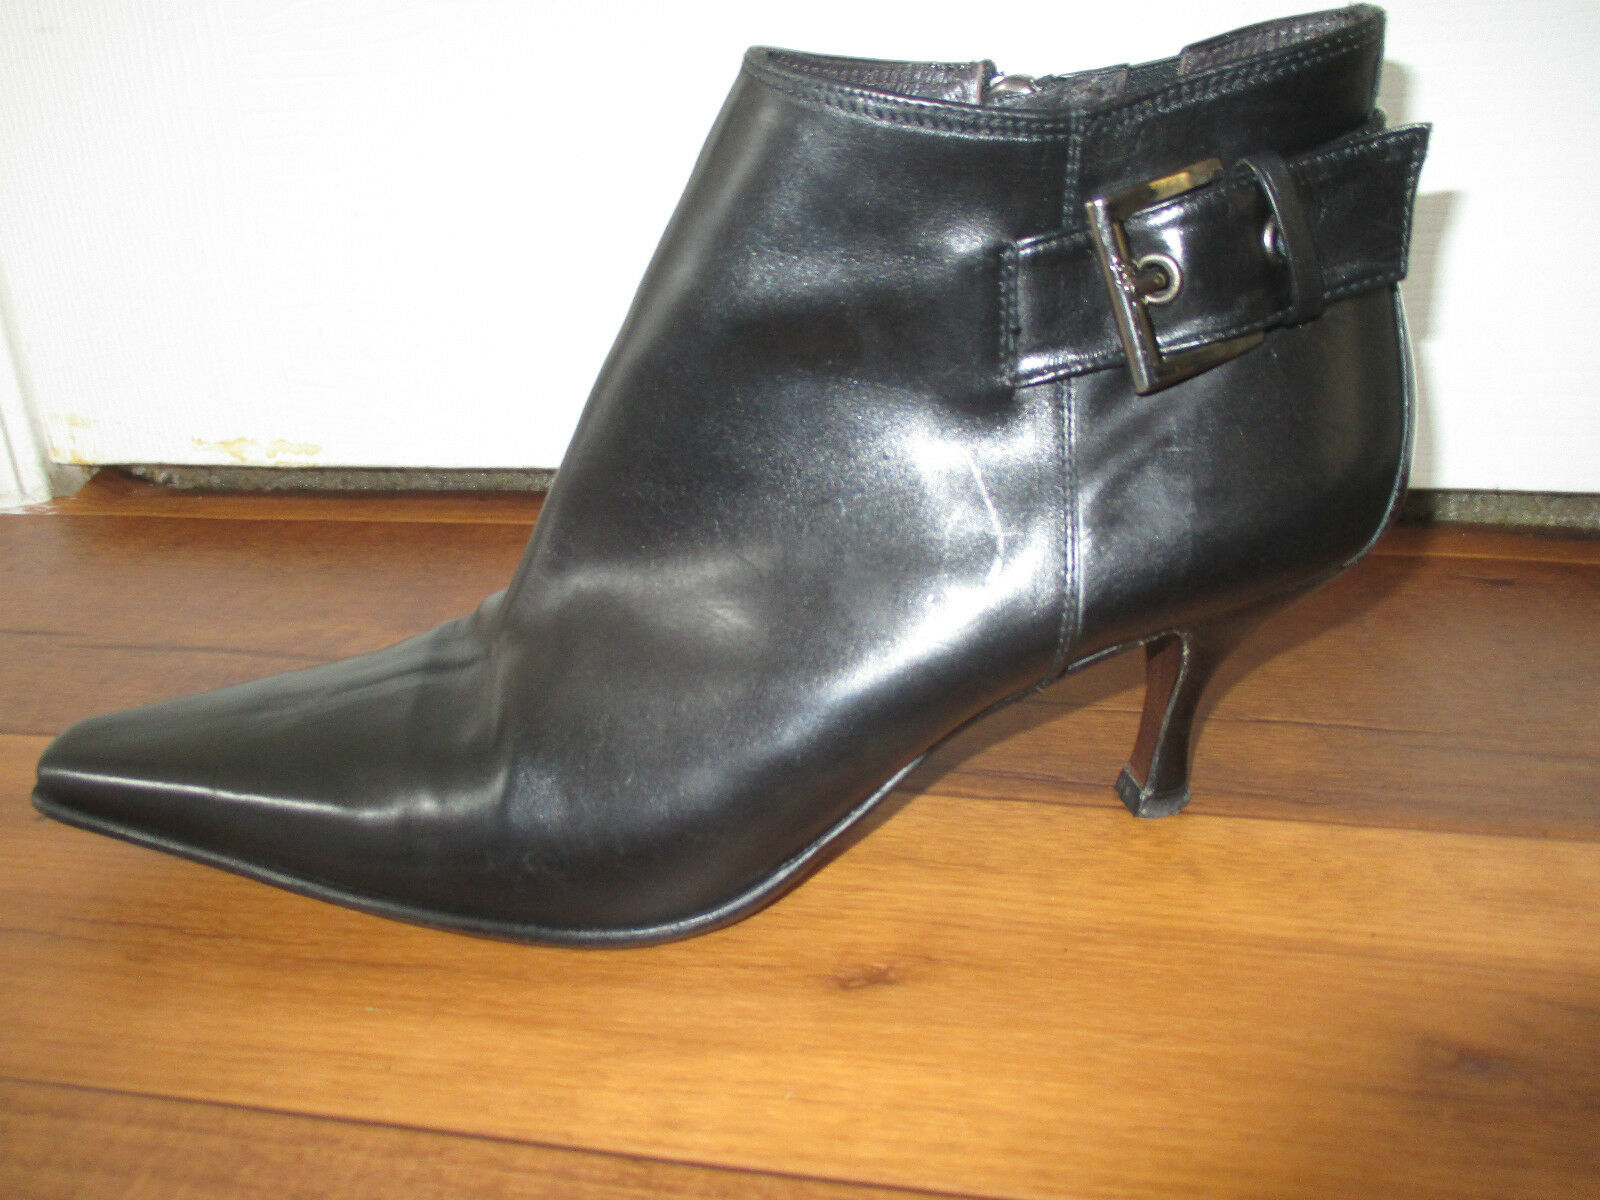 Women's Donald J. Pliner Loni Black Leather Ankle Boot Size 8 1/2 M